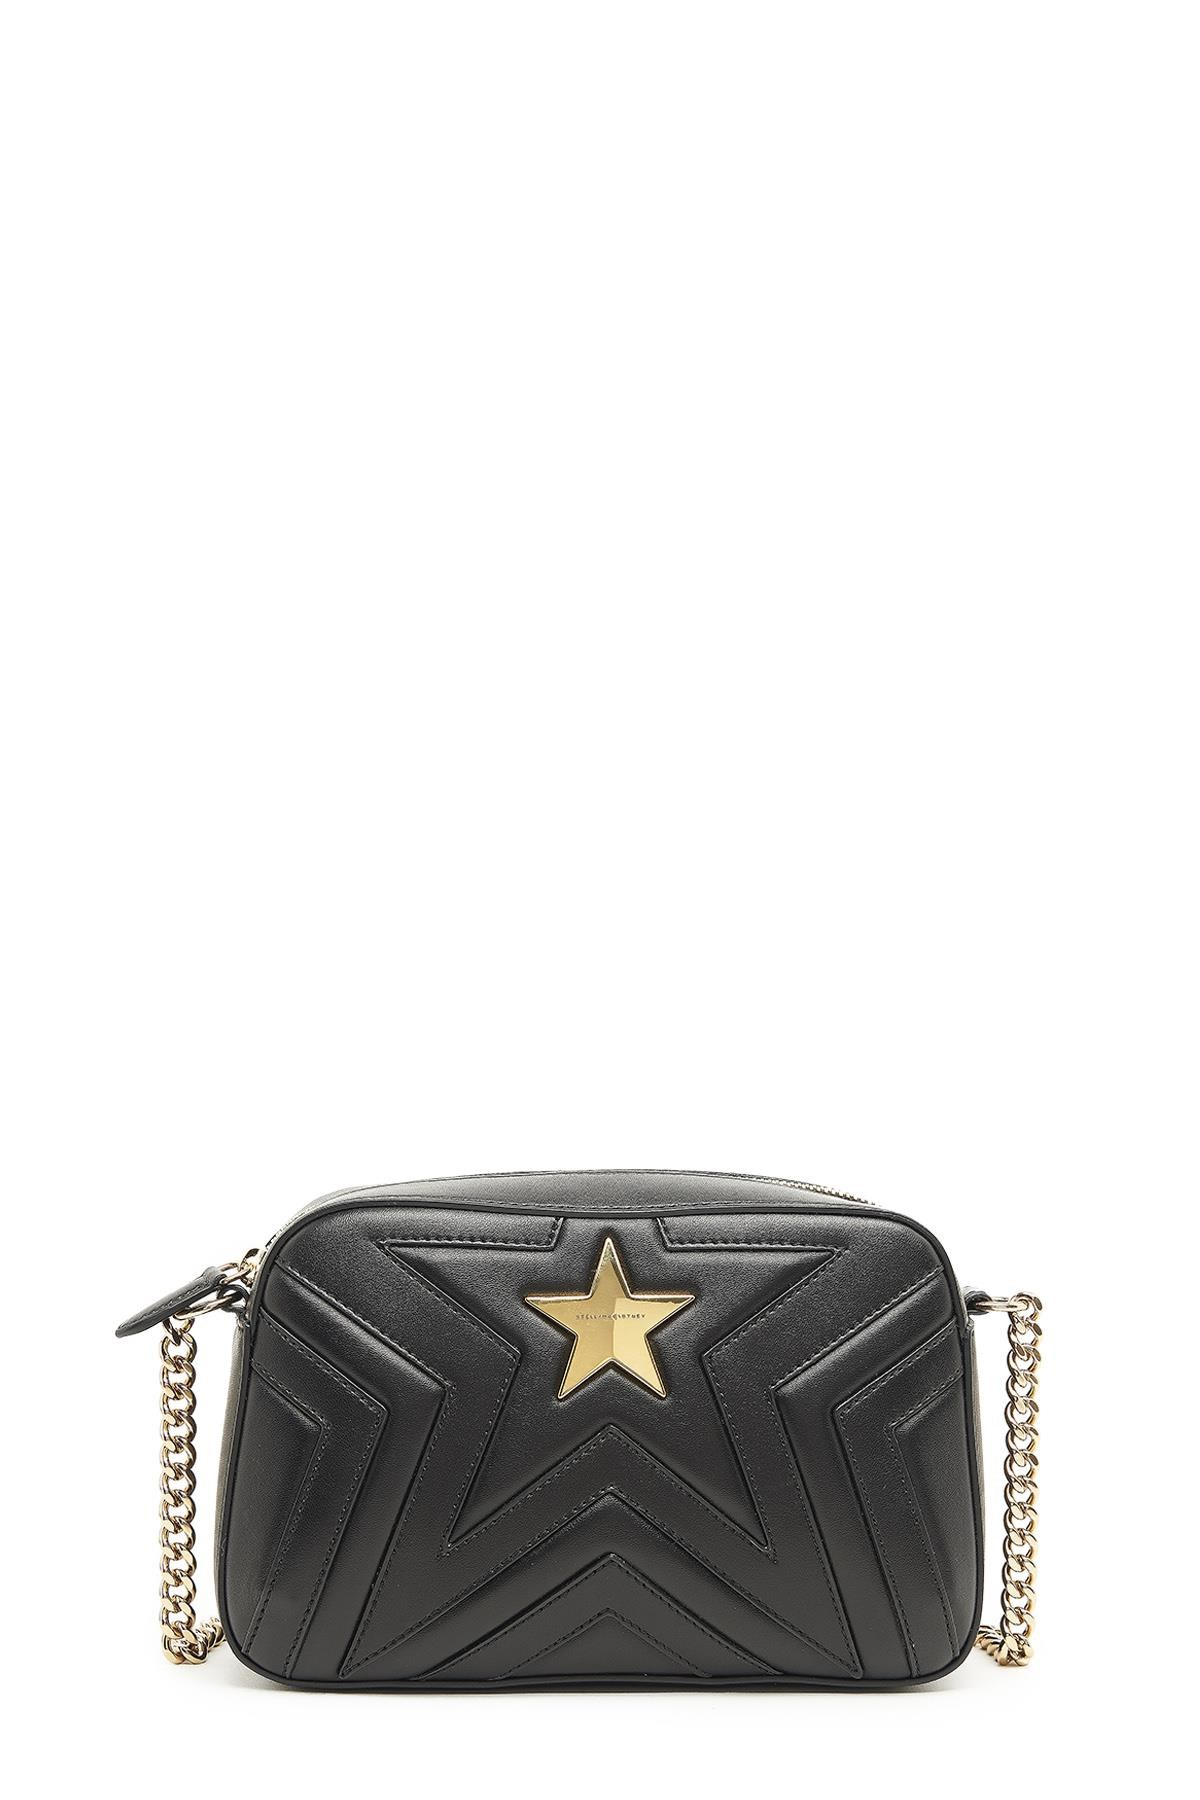 249f64d1a139 stella mccartney  stella star  crossbody bag available on julian ...